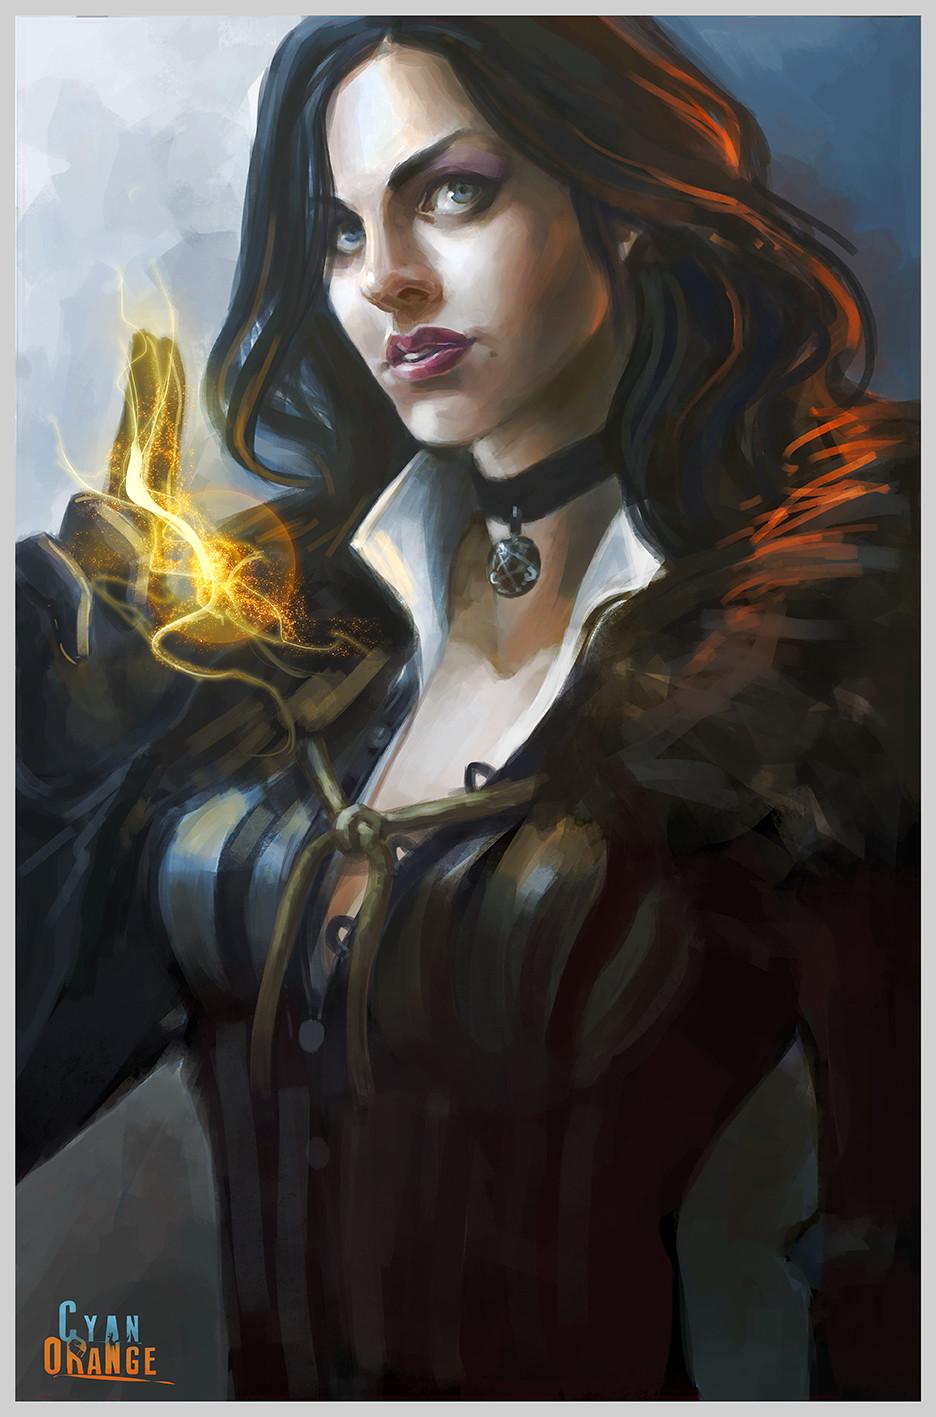 Artstation Yennefer The Witcher 3 Fanart Cyan Orange